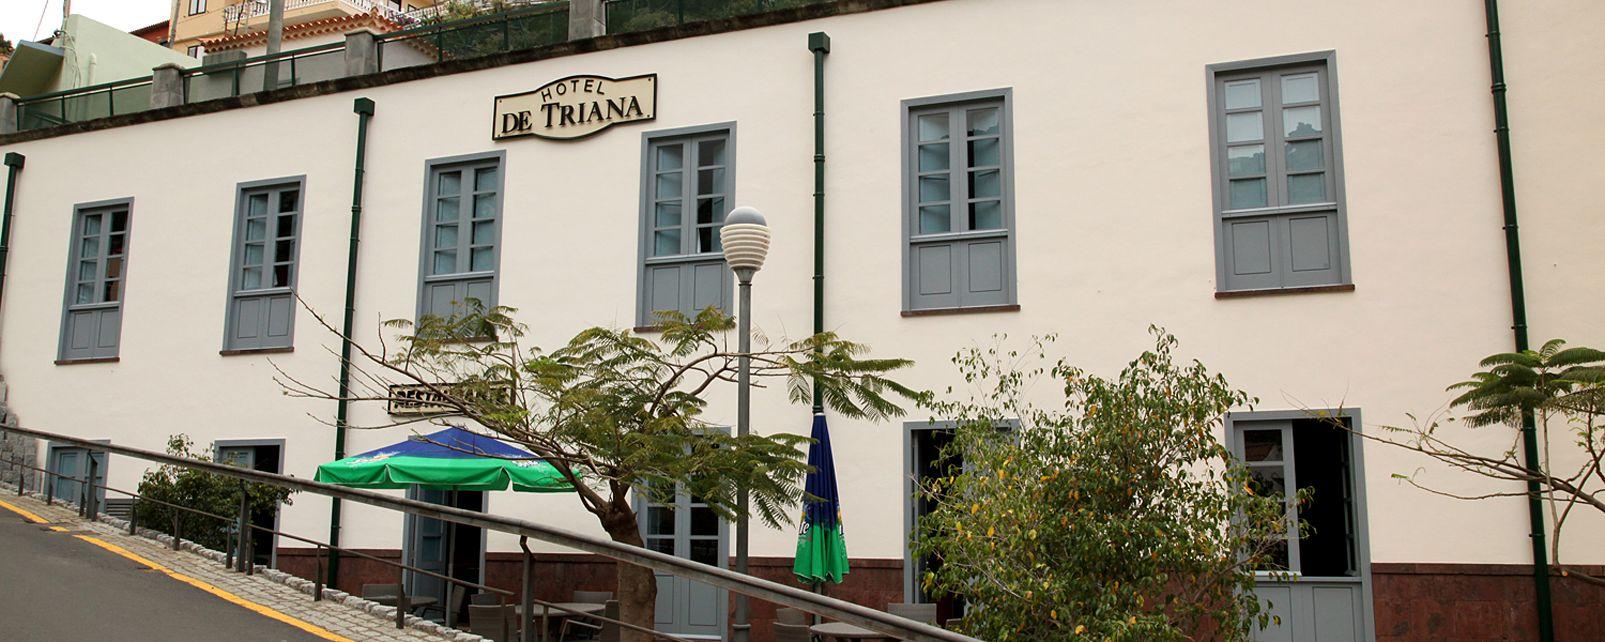 Hôtel de Triana